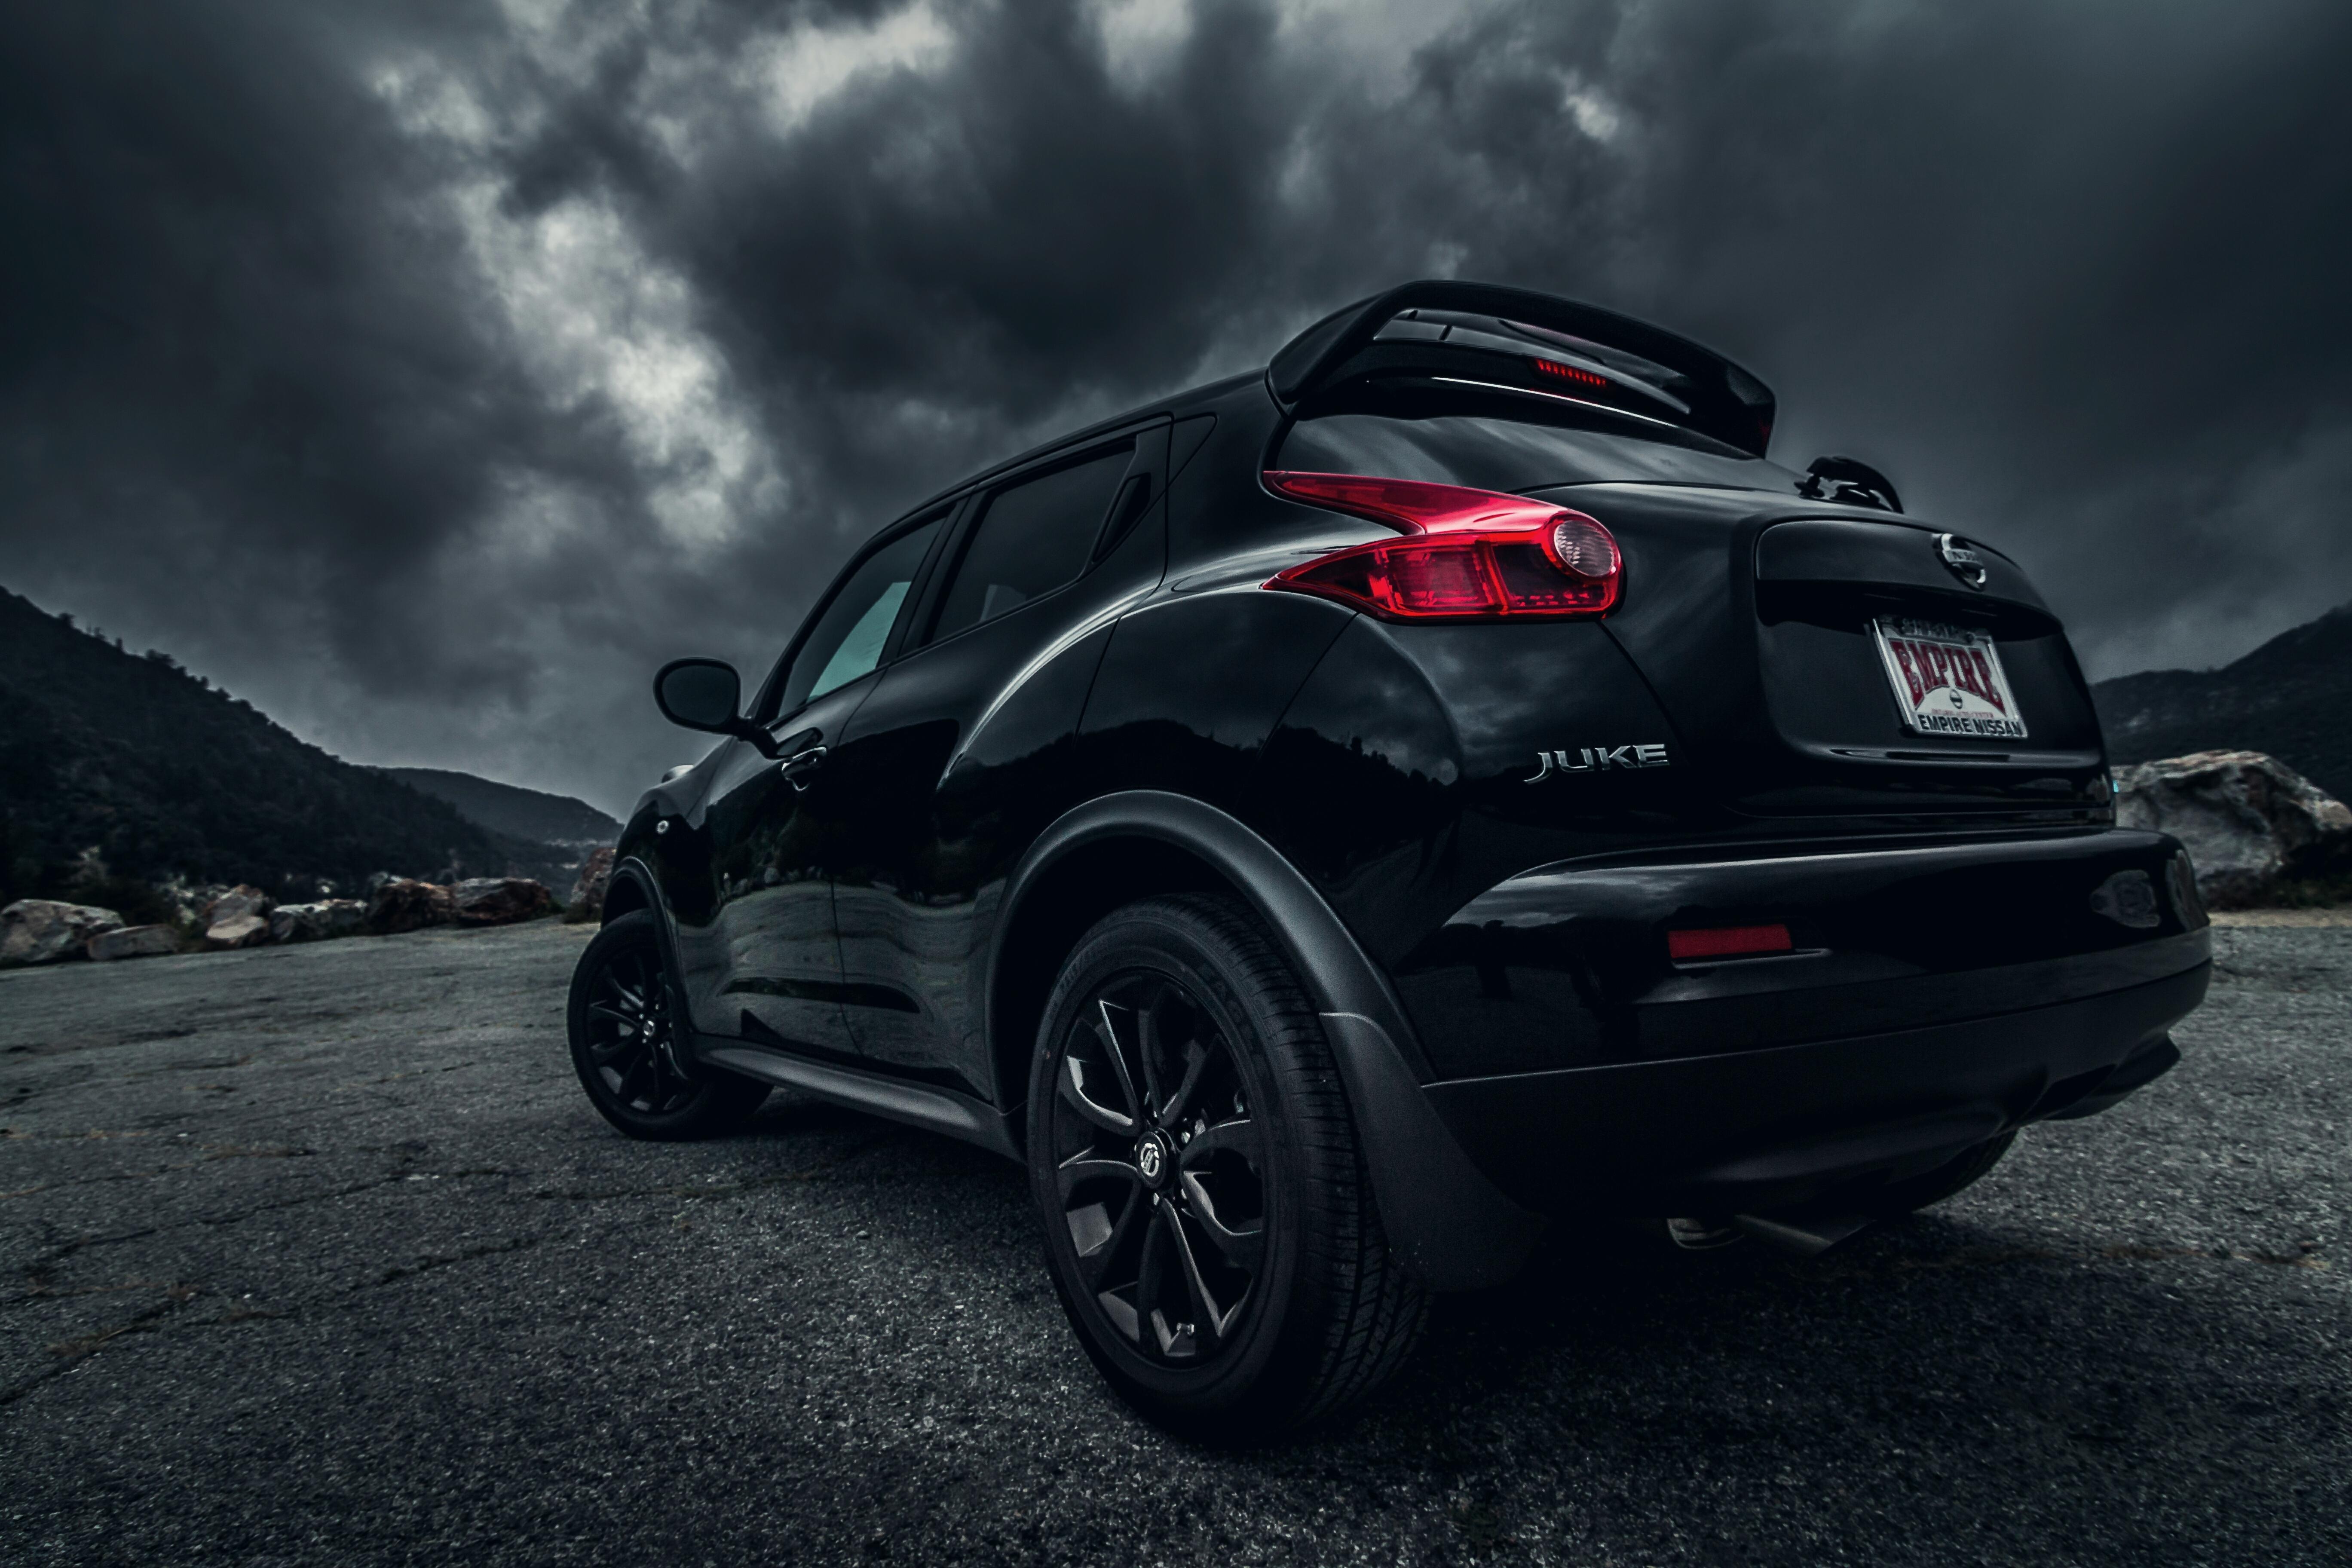 Картинка: Автомобиль, Nissan, Juke, чёрный, асфальт, тучи, горы